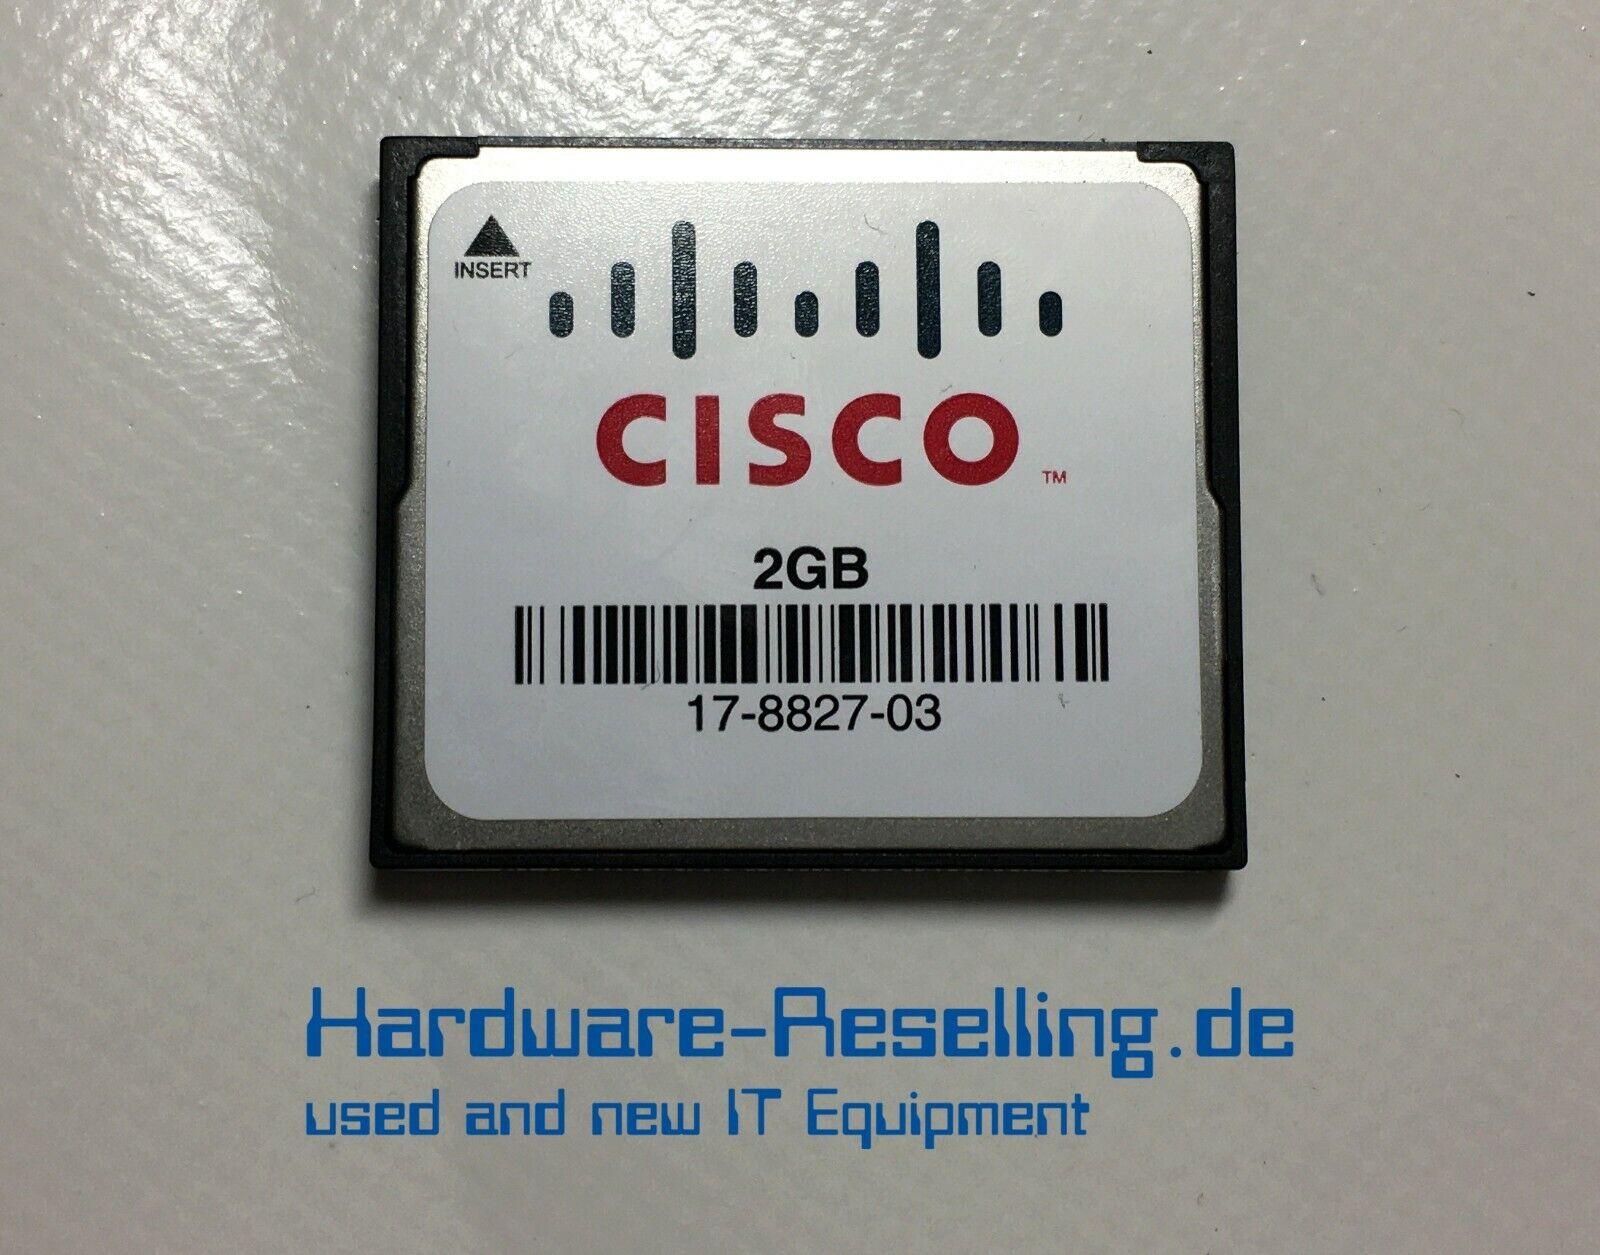 Cisco 2GB Compact Flash Memory Card UGB30STC2000Z4-EAM-8SD 17-8827-03